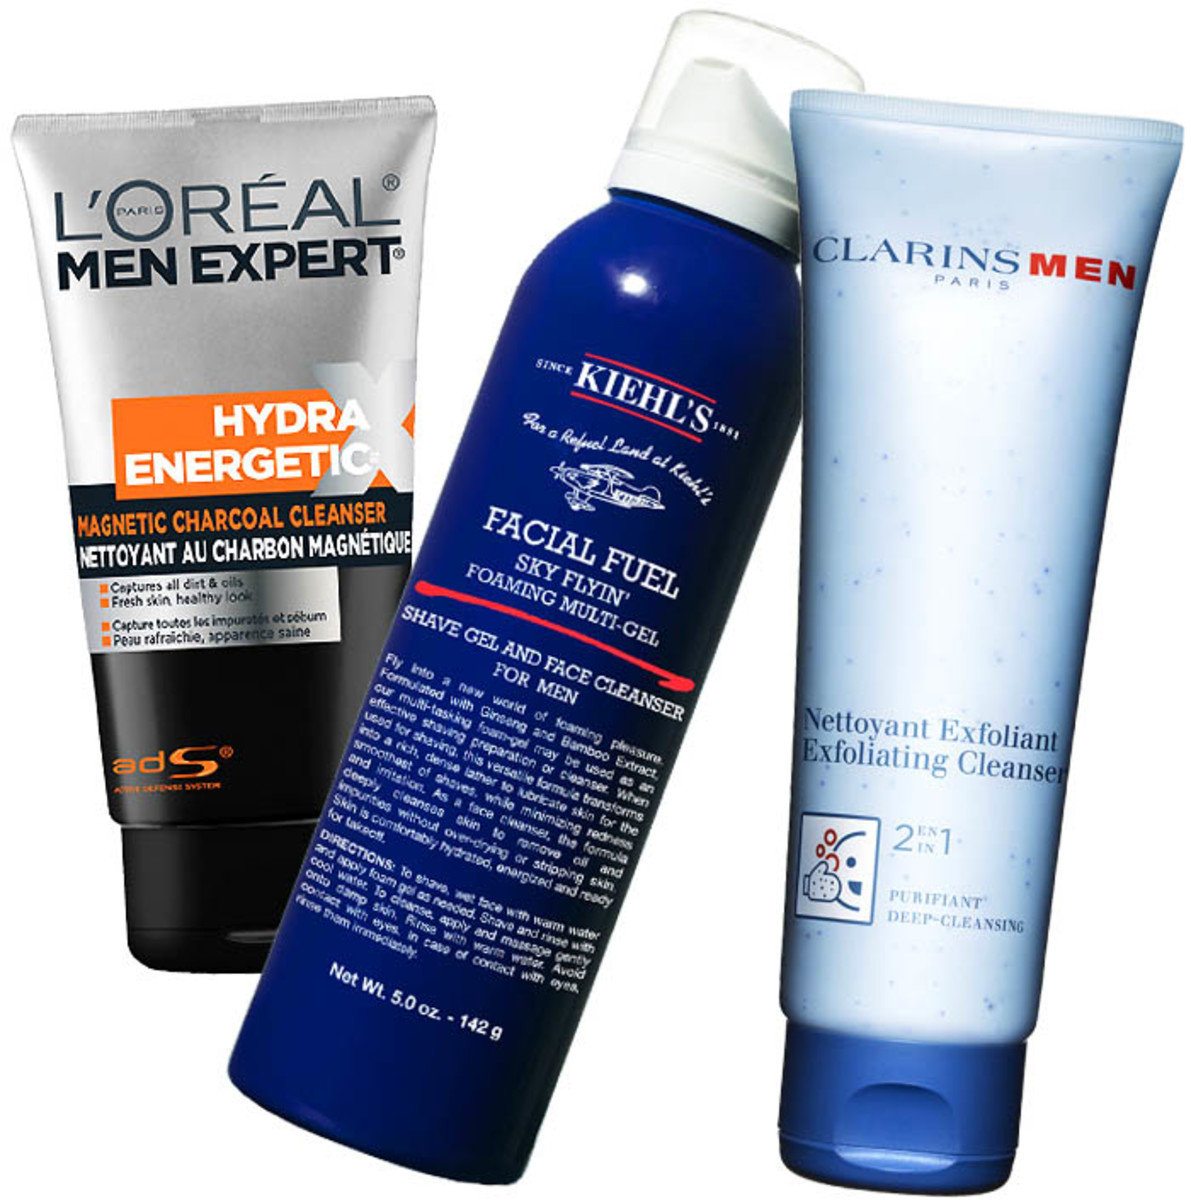 Father's Day_L'Oreal Paris Men Expert Charcoal Cleanser_Kiehl's Facial Fuel Foaming Multi Gel_Clarins Men Exfoliating Cleanser